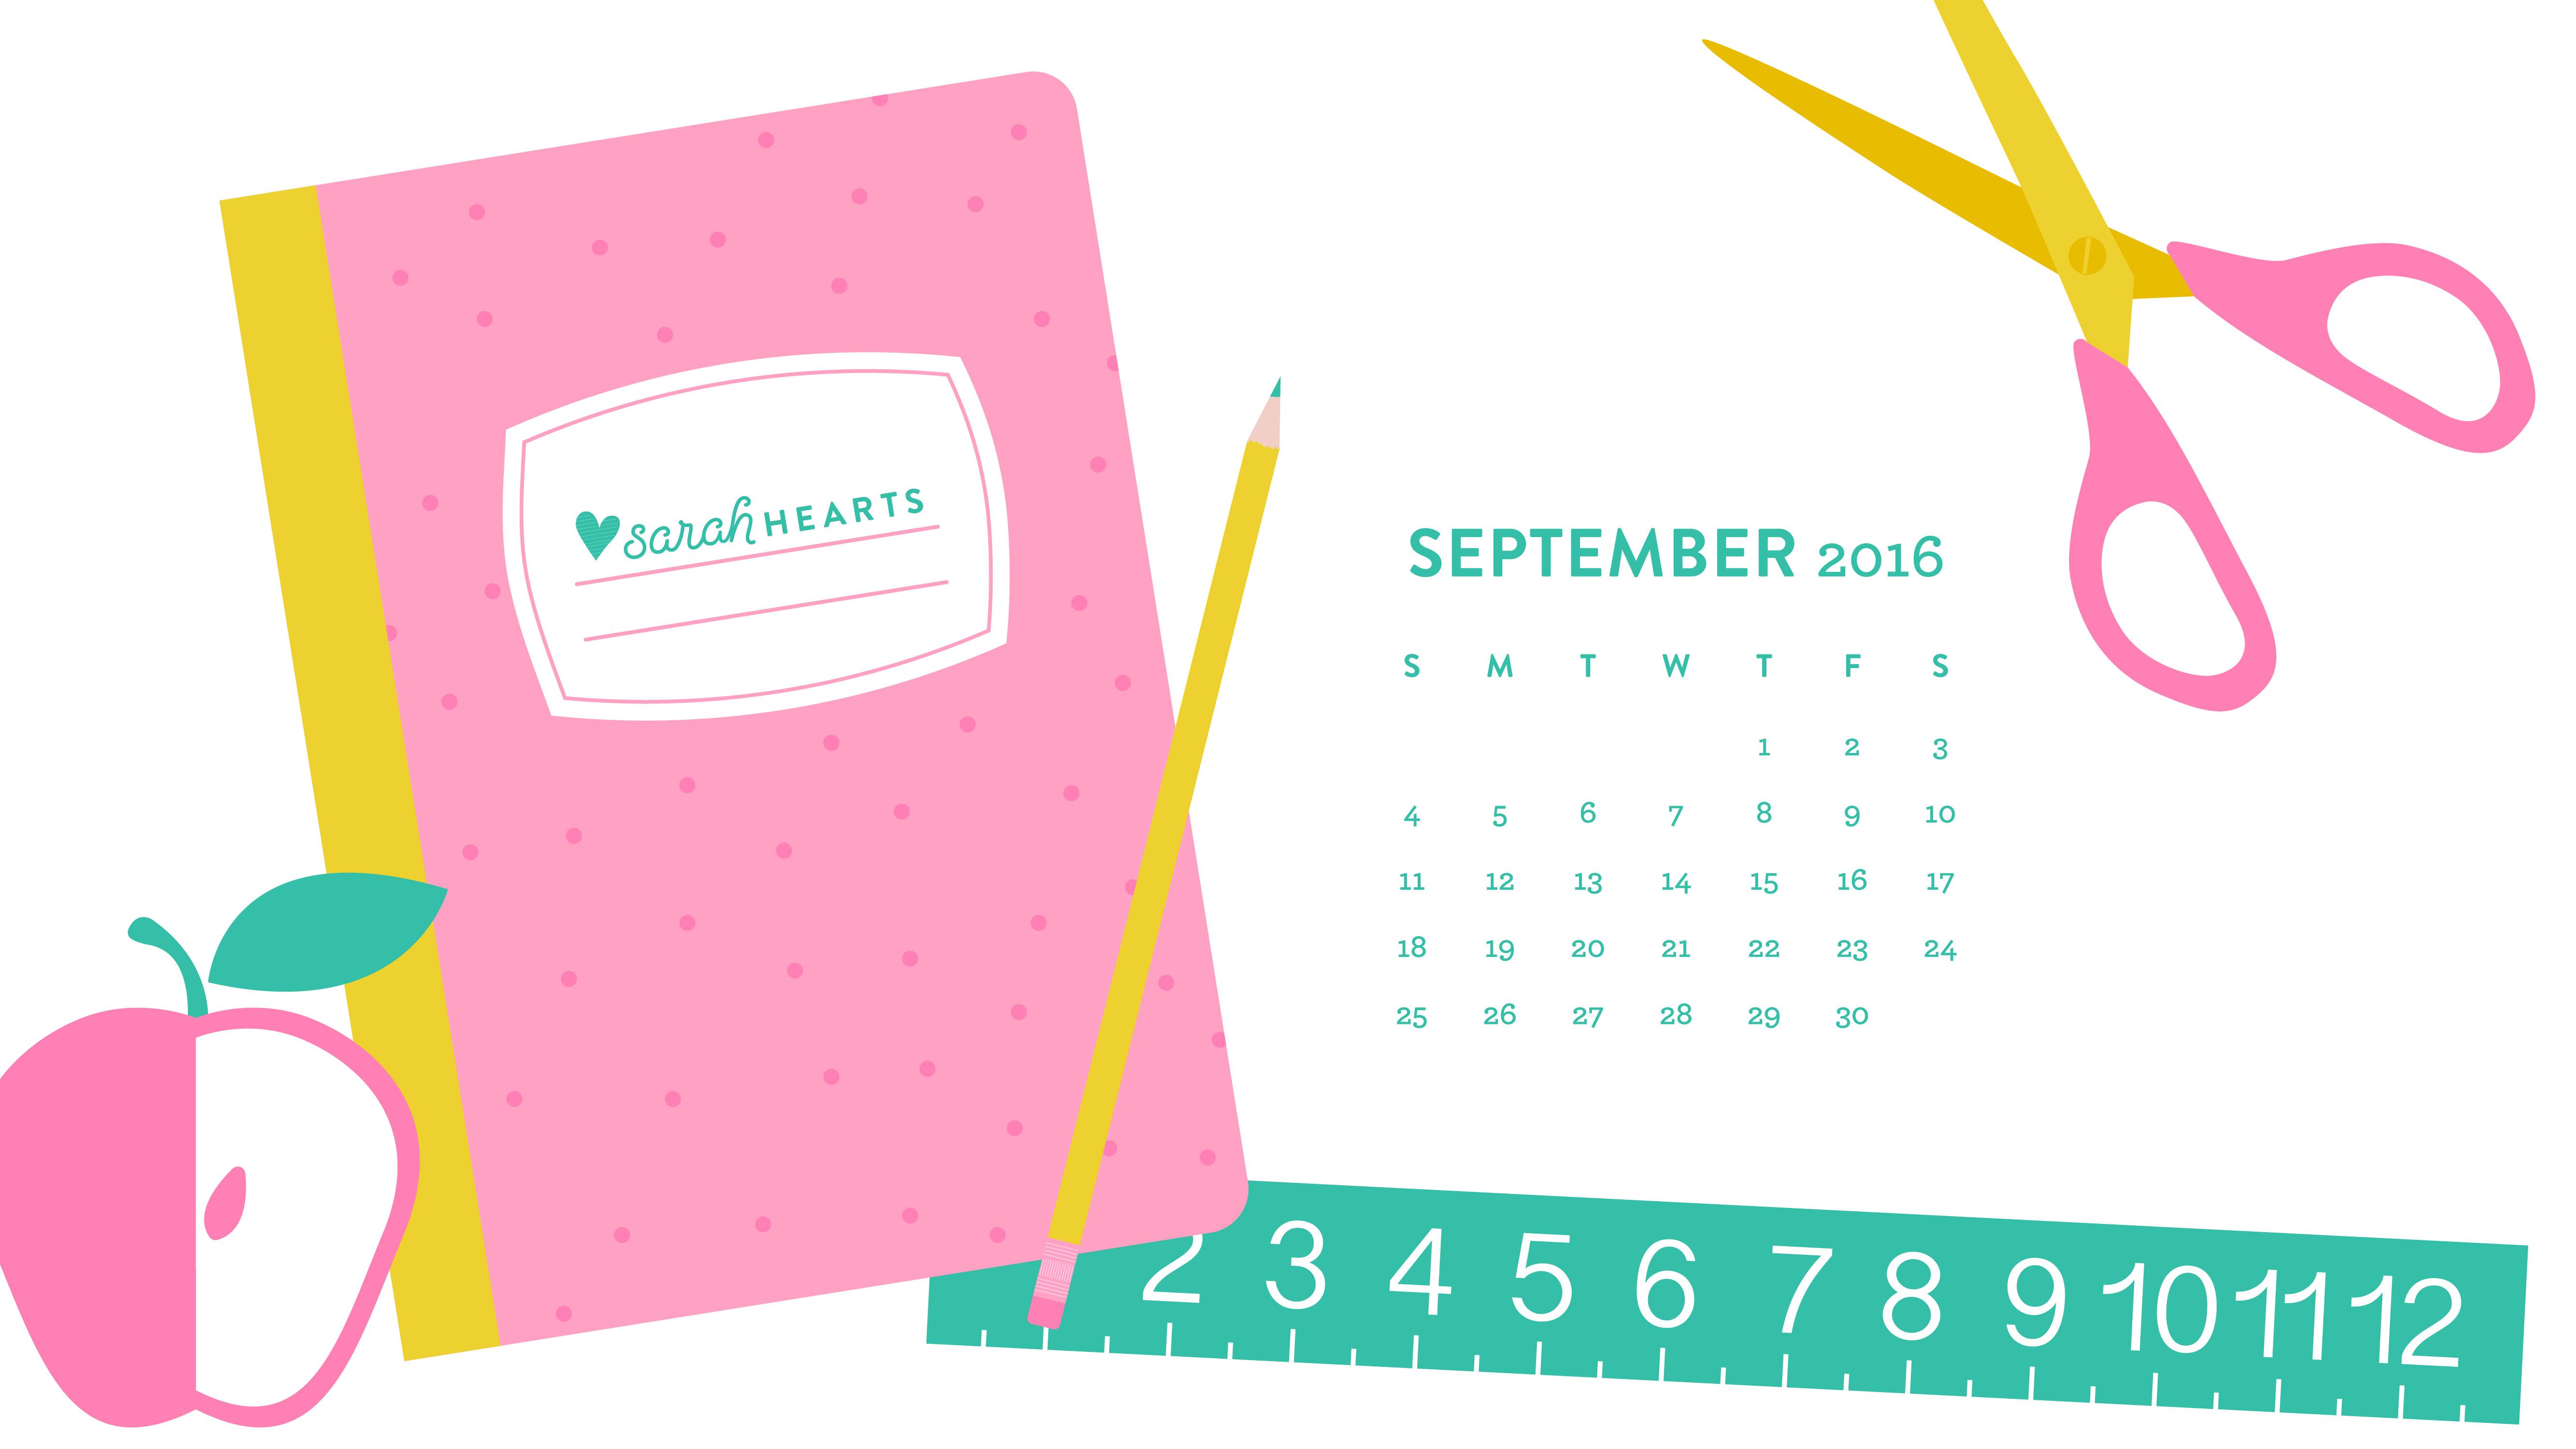 Cute Designs Full Page Wallpapers September 2016 Back To School Calendar Wallpaper Sarah